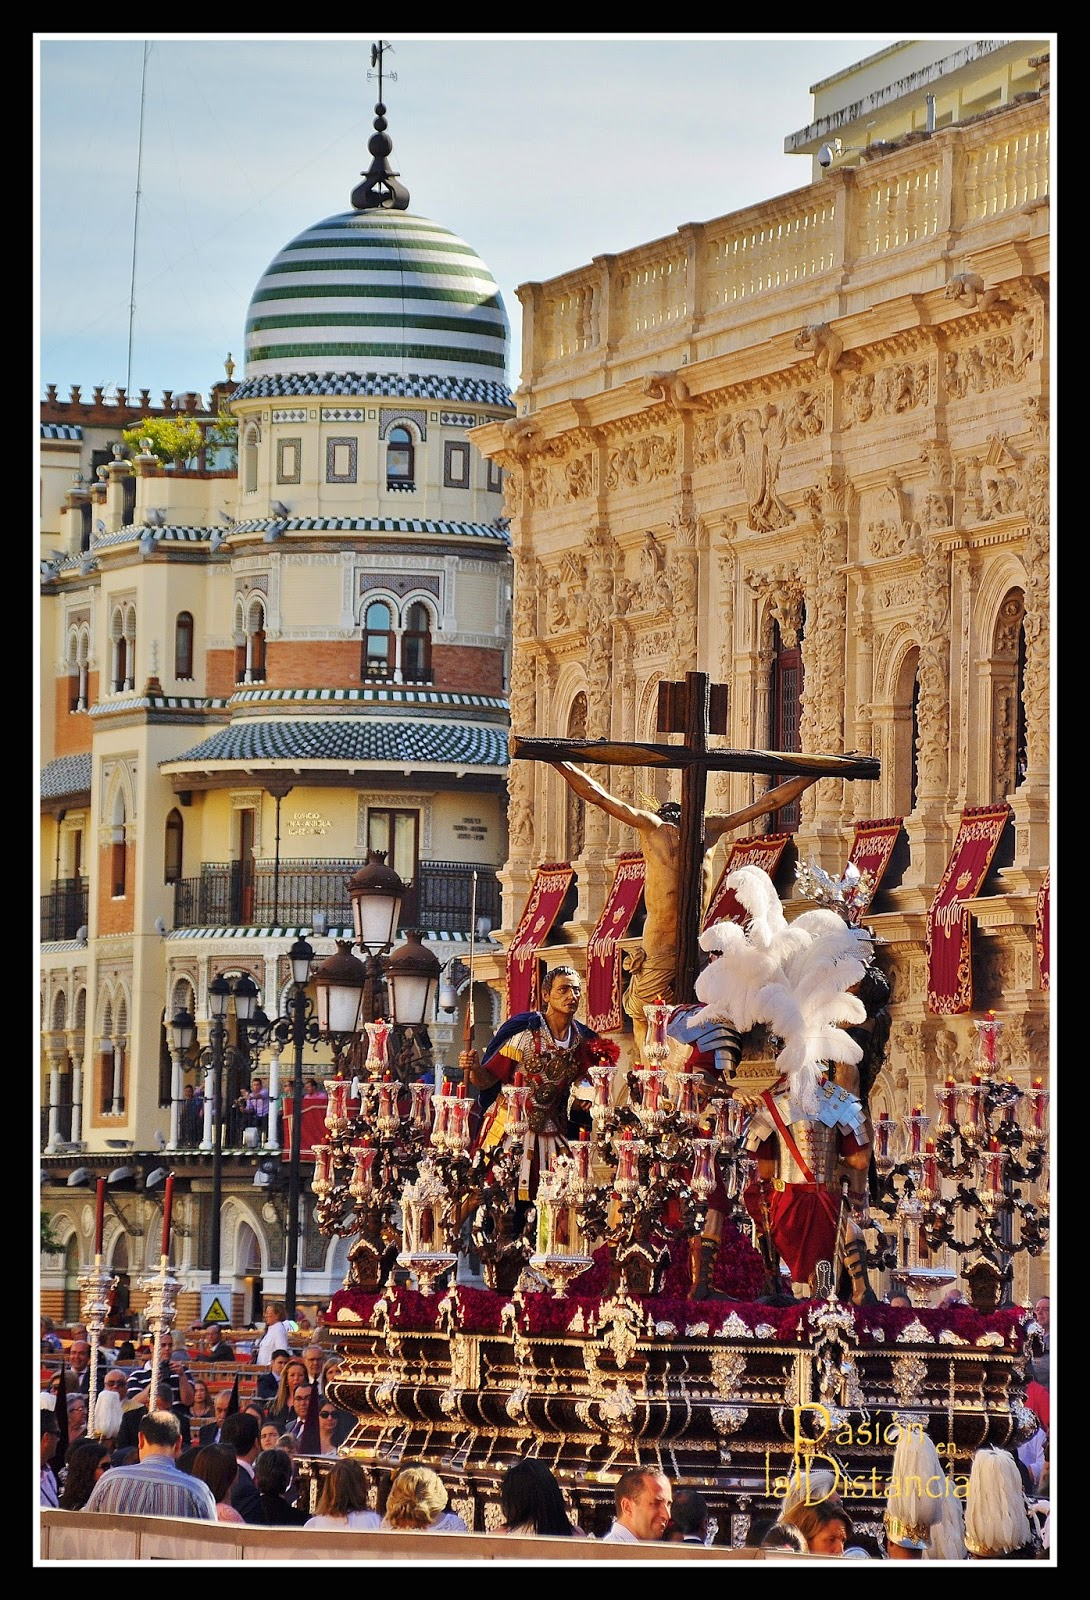 Misterio Cristo del Desamparo y Abandono por Plaza San Francisco Sevilla 2015